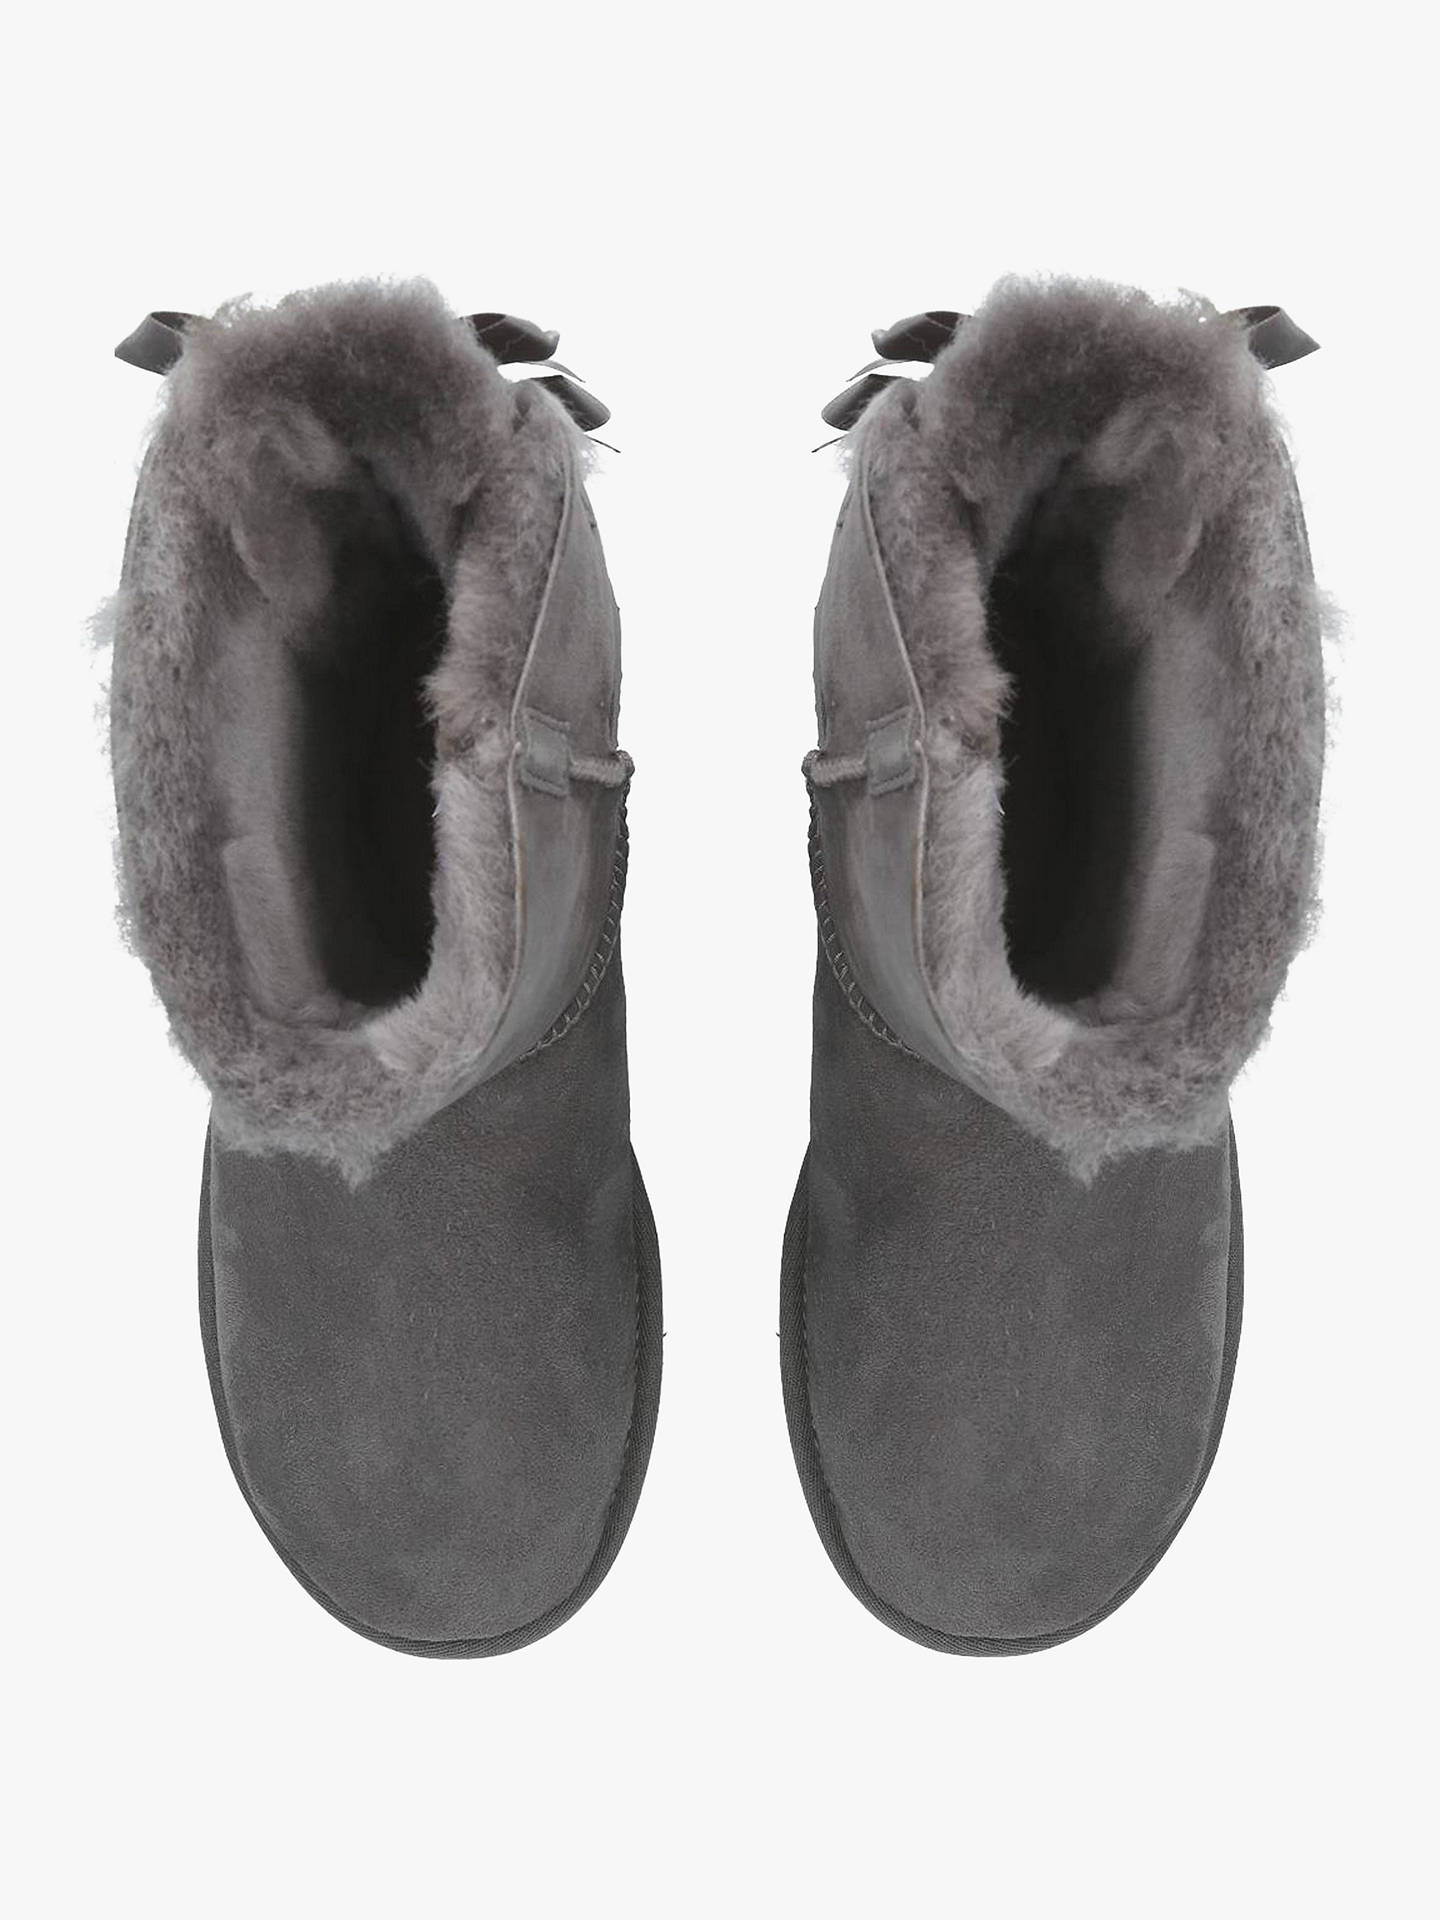 dd0238bfc9b UGG Bailey Bow Sheepskin Short Boots at John Lewis & Partners